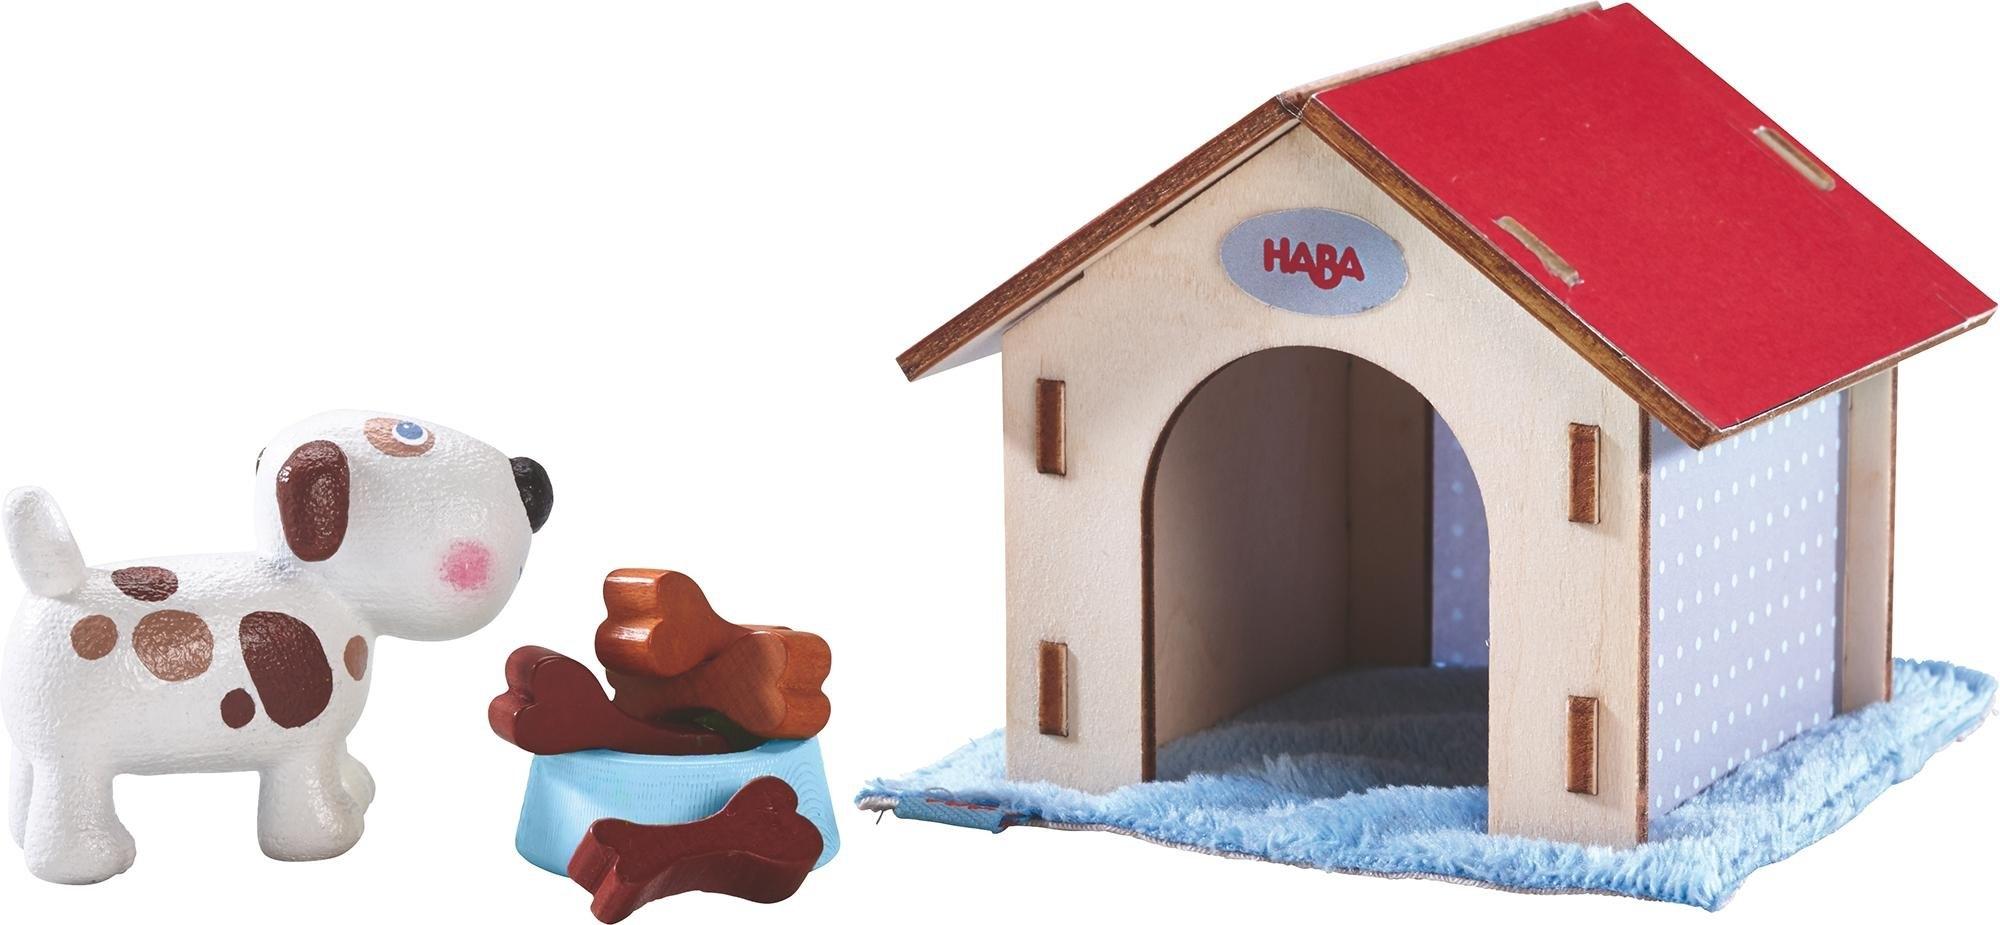 HABA ® speelfigurenset, »Little Friends - hond Lucky« nu online bestellen